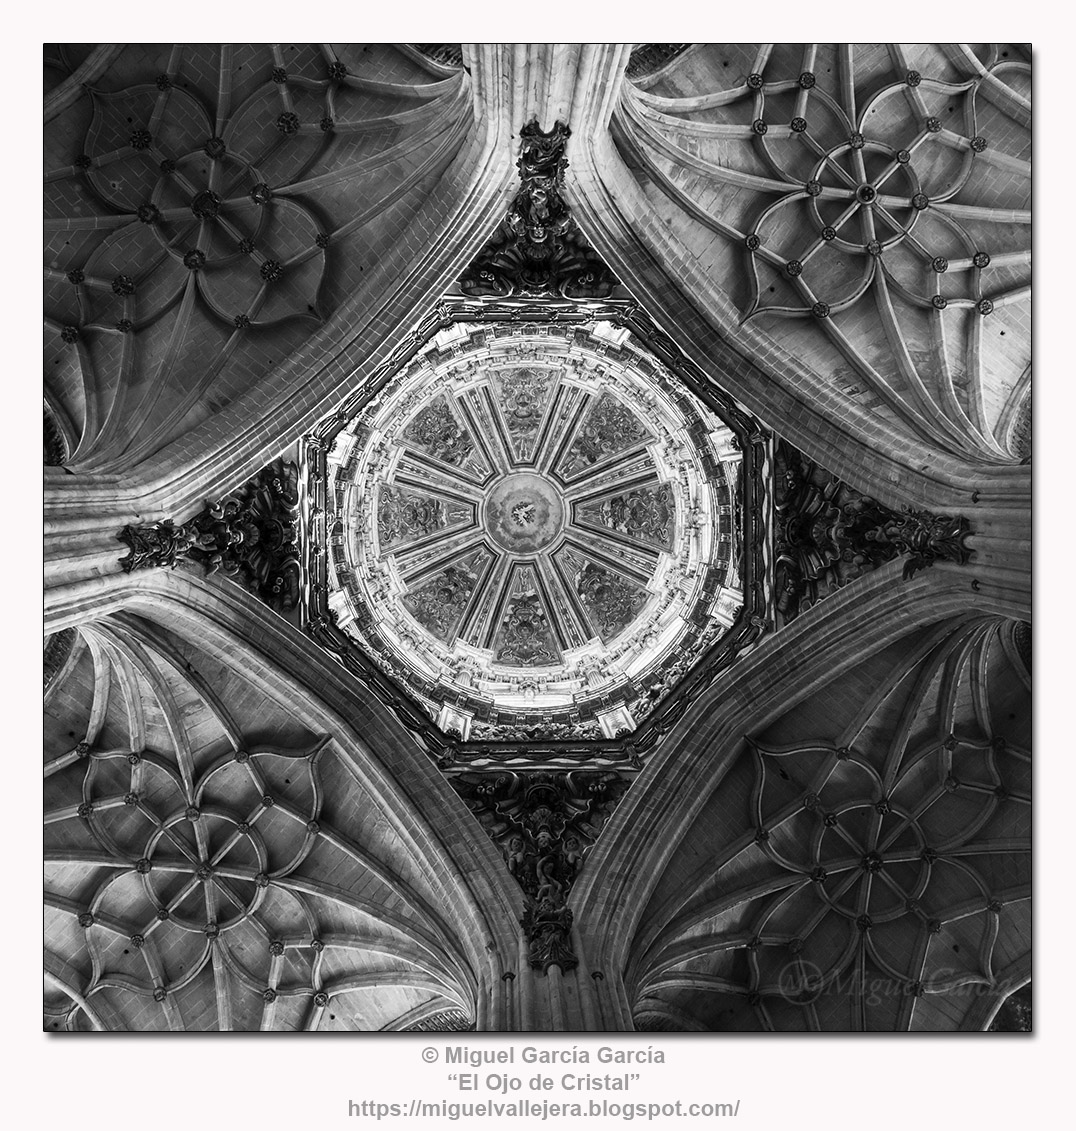 Cúpula de la Catedral Nueva de Salamanca.